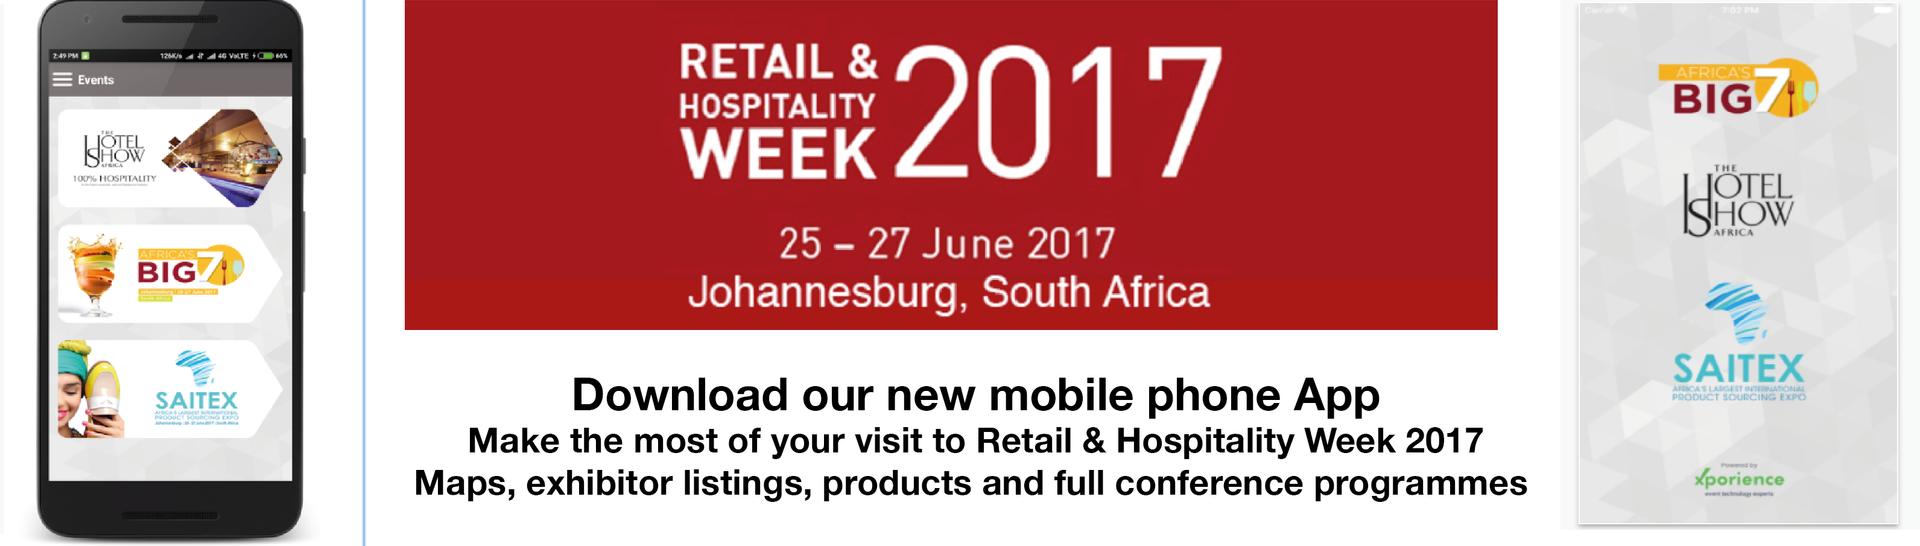 Retail & Hospitality Week SHow app